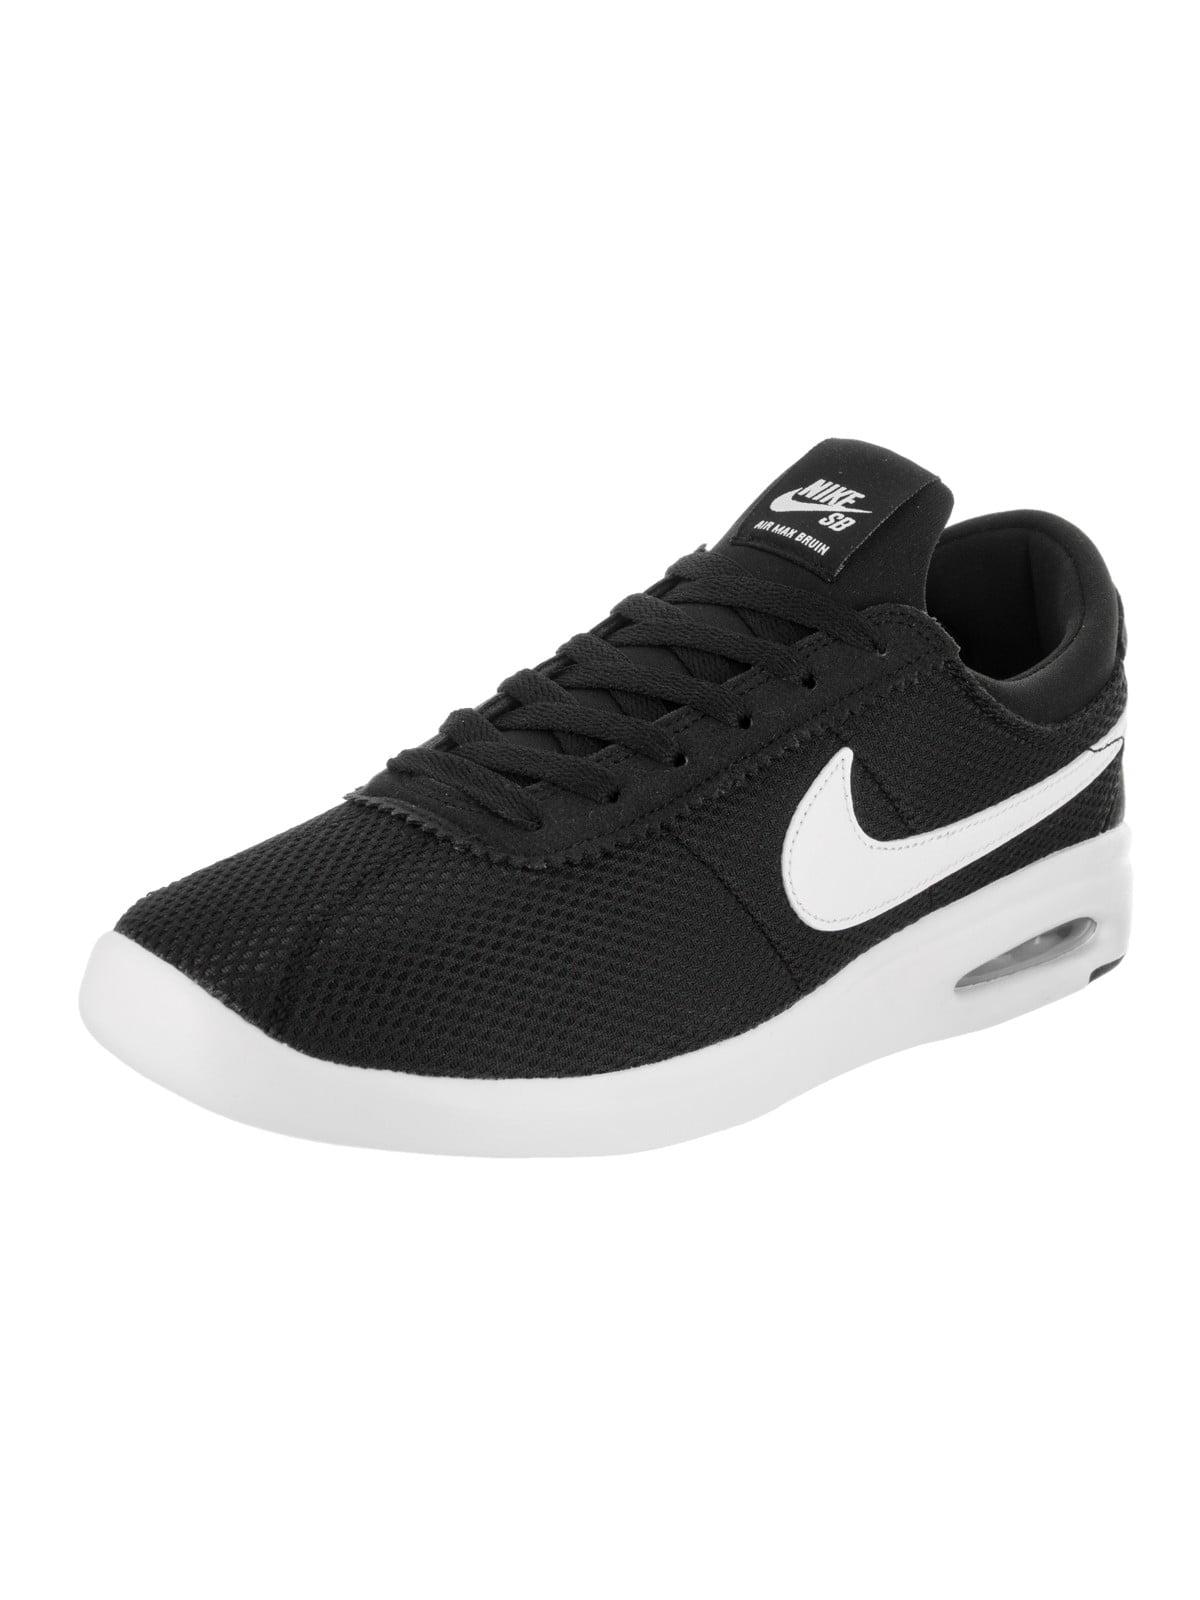 a053d66fa6e Nike Men s SB Air Max Bruin VPR TxT Skate Shoe